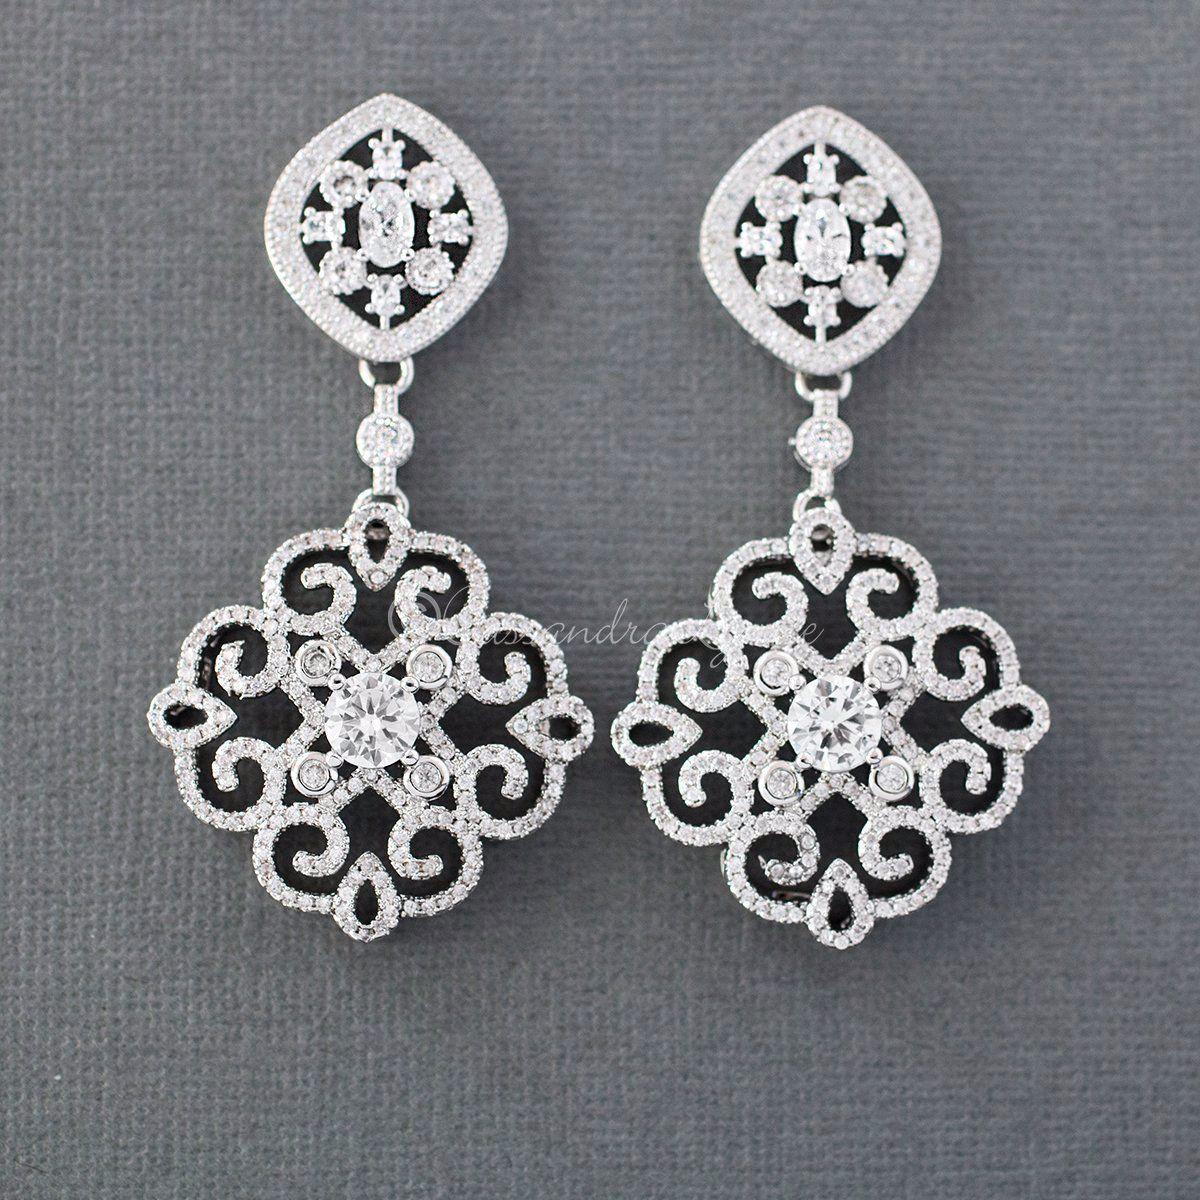 Bridal Earrings of CZ Filigree Medallions   jewels and ...